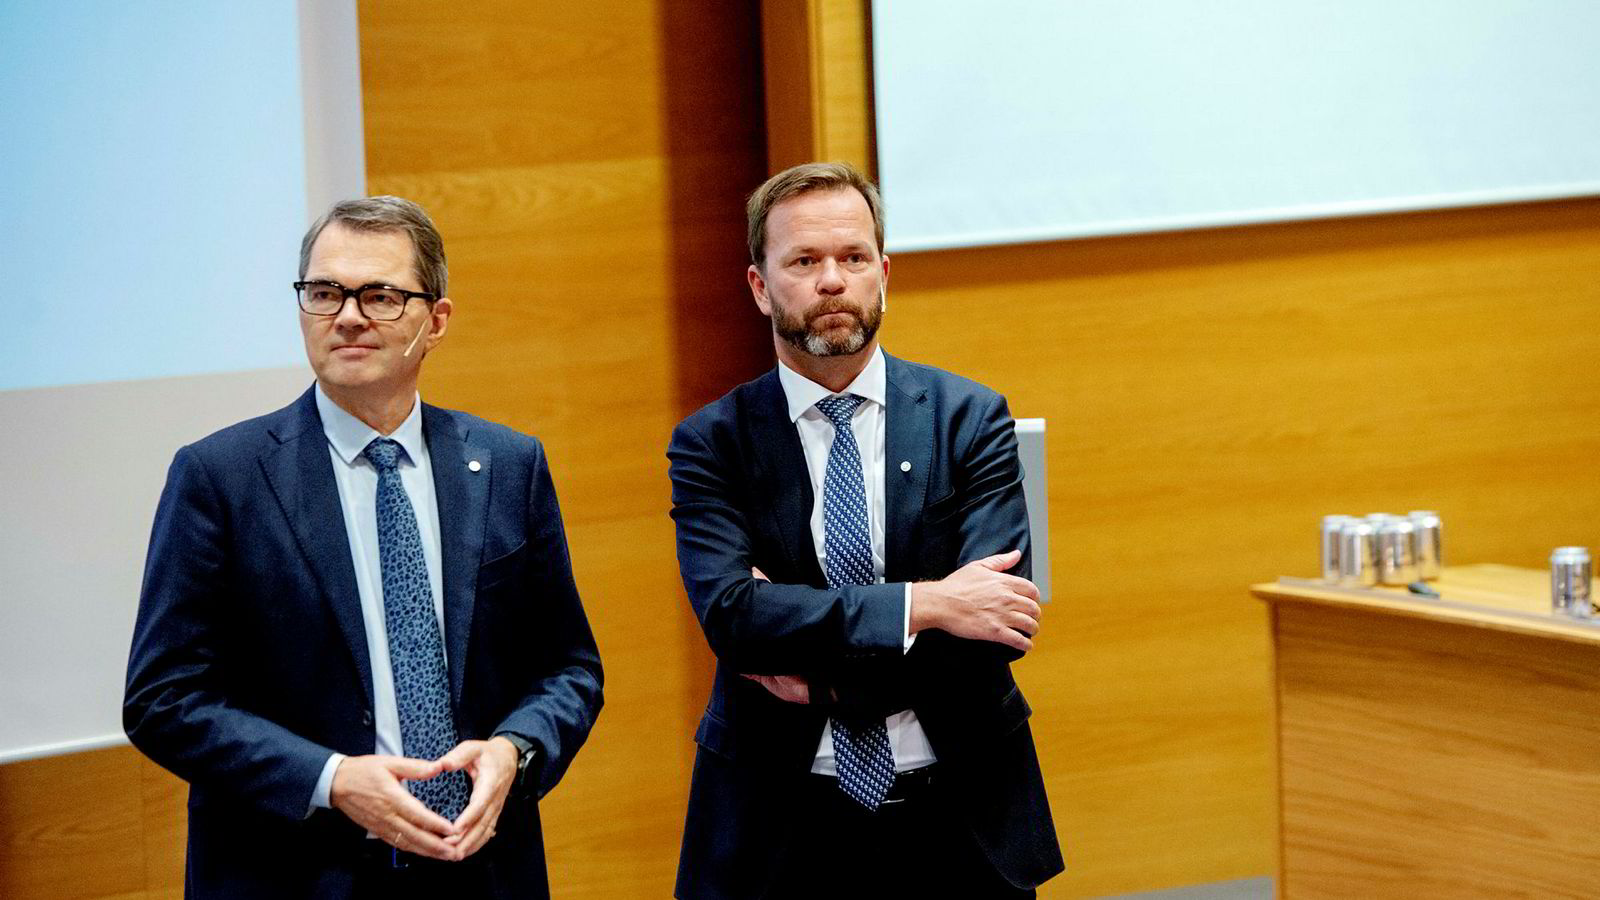 Konsernsjef Svein Richard Brandtzæg (til venstre) og finansdirektør Eivind Kallevik under Hydros siste kvartalspresentasjon.